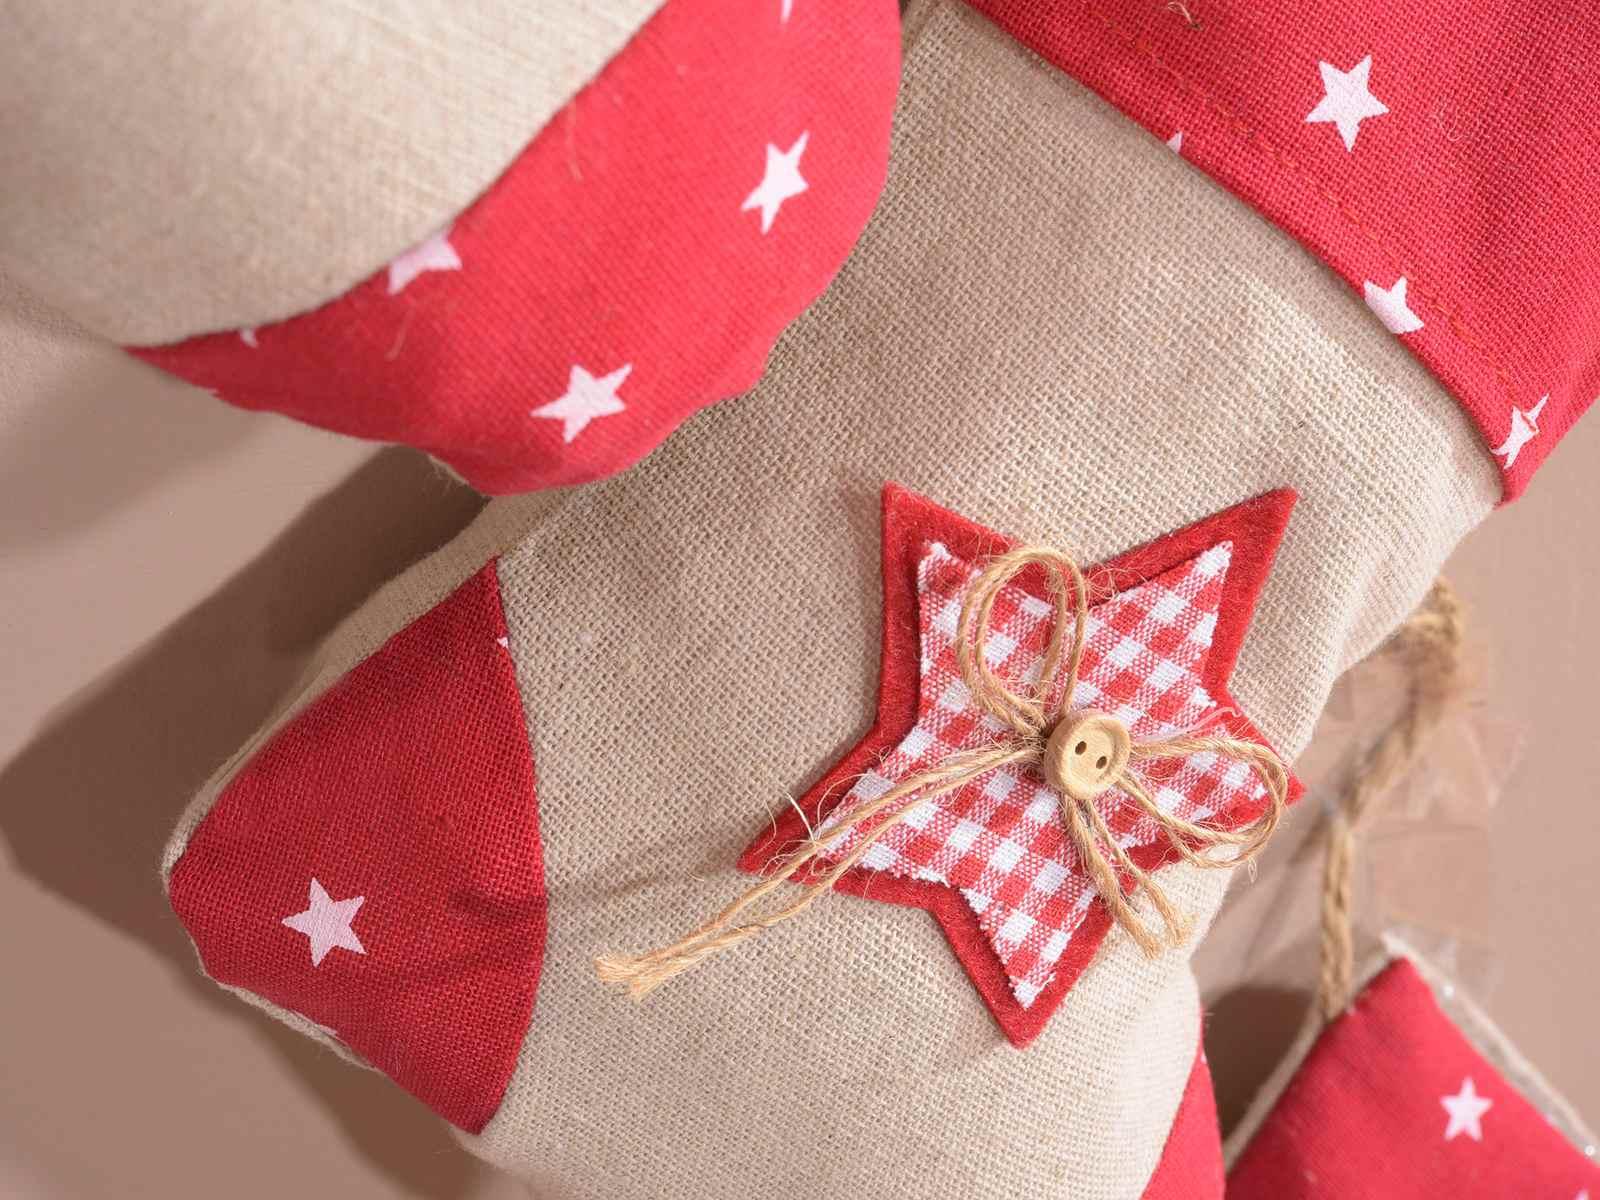 Calcetin Navideo Elegant Calcetn De Navidad Bota Navidea En Fieltro